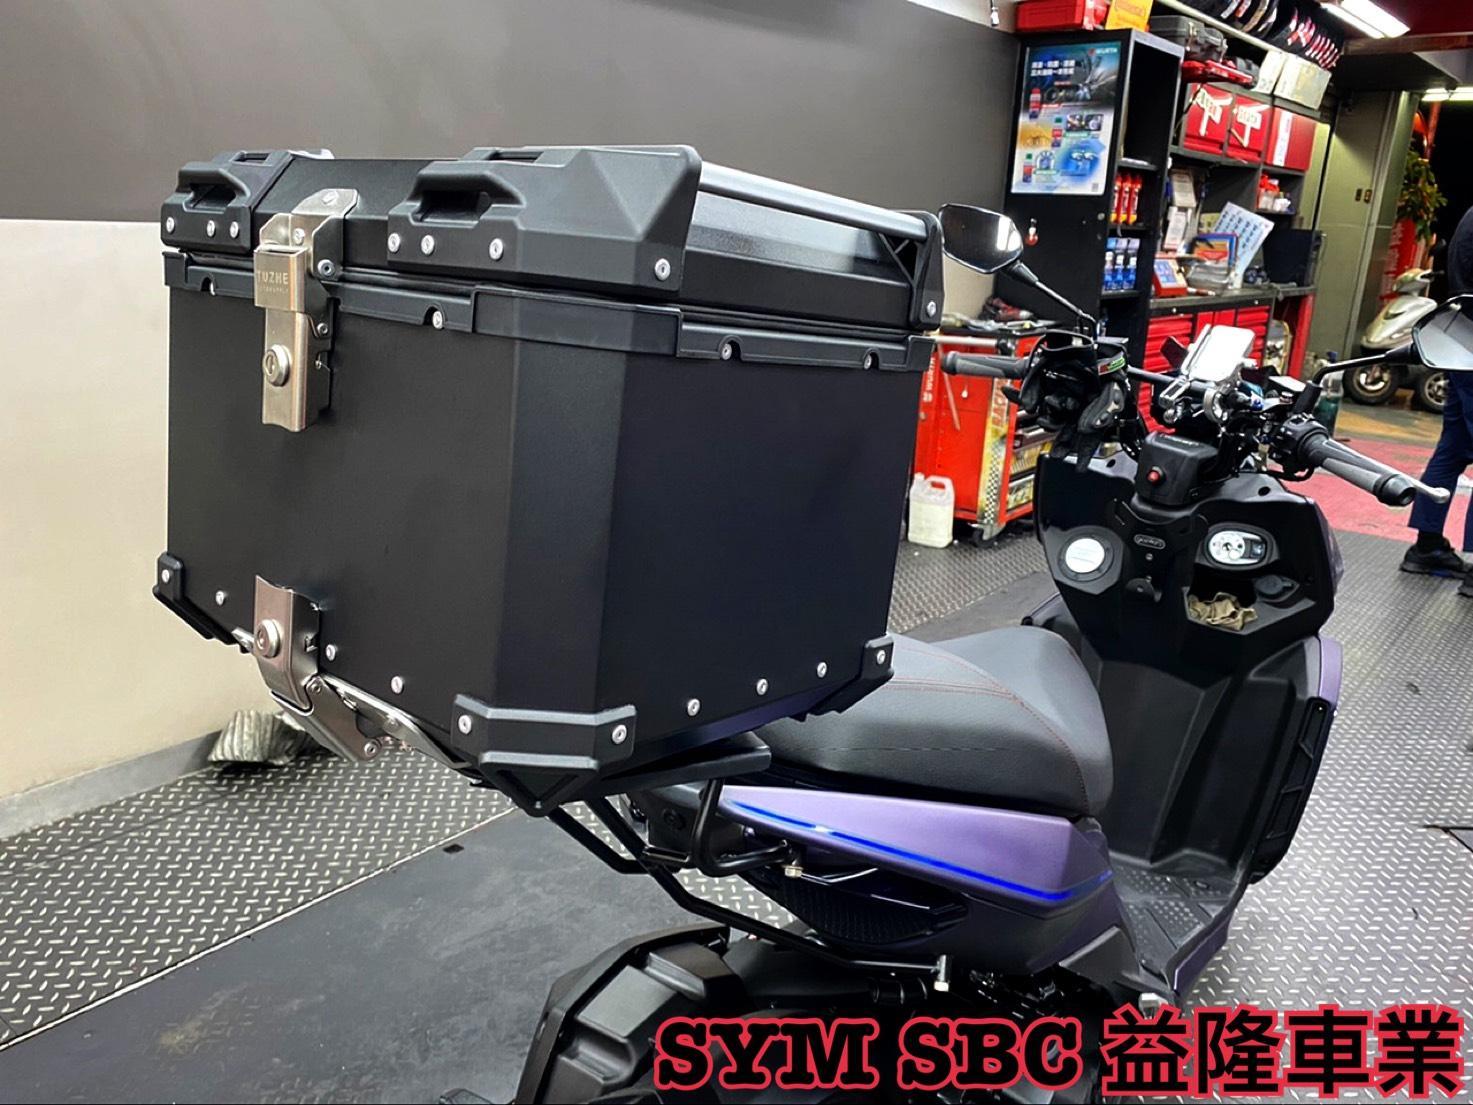 SYM DRG 158 安裝 後箱架+40L鋁箱.後漢堡箱.旅行箱+後腰靠*SYM SBC 益隆車業*